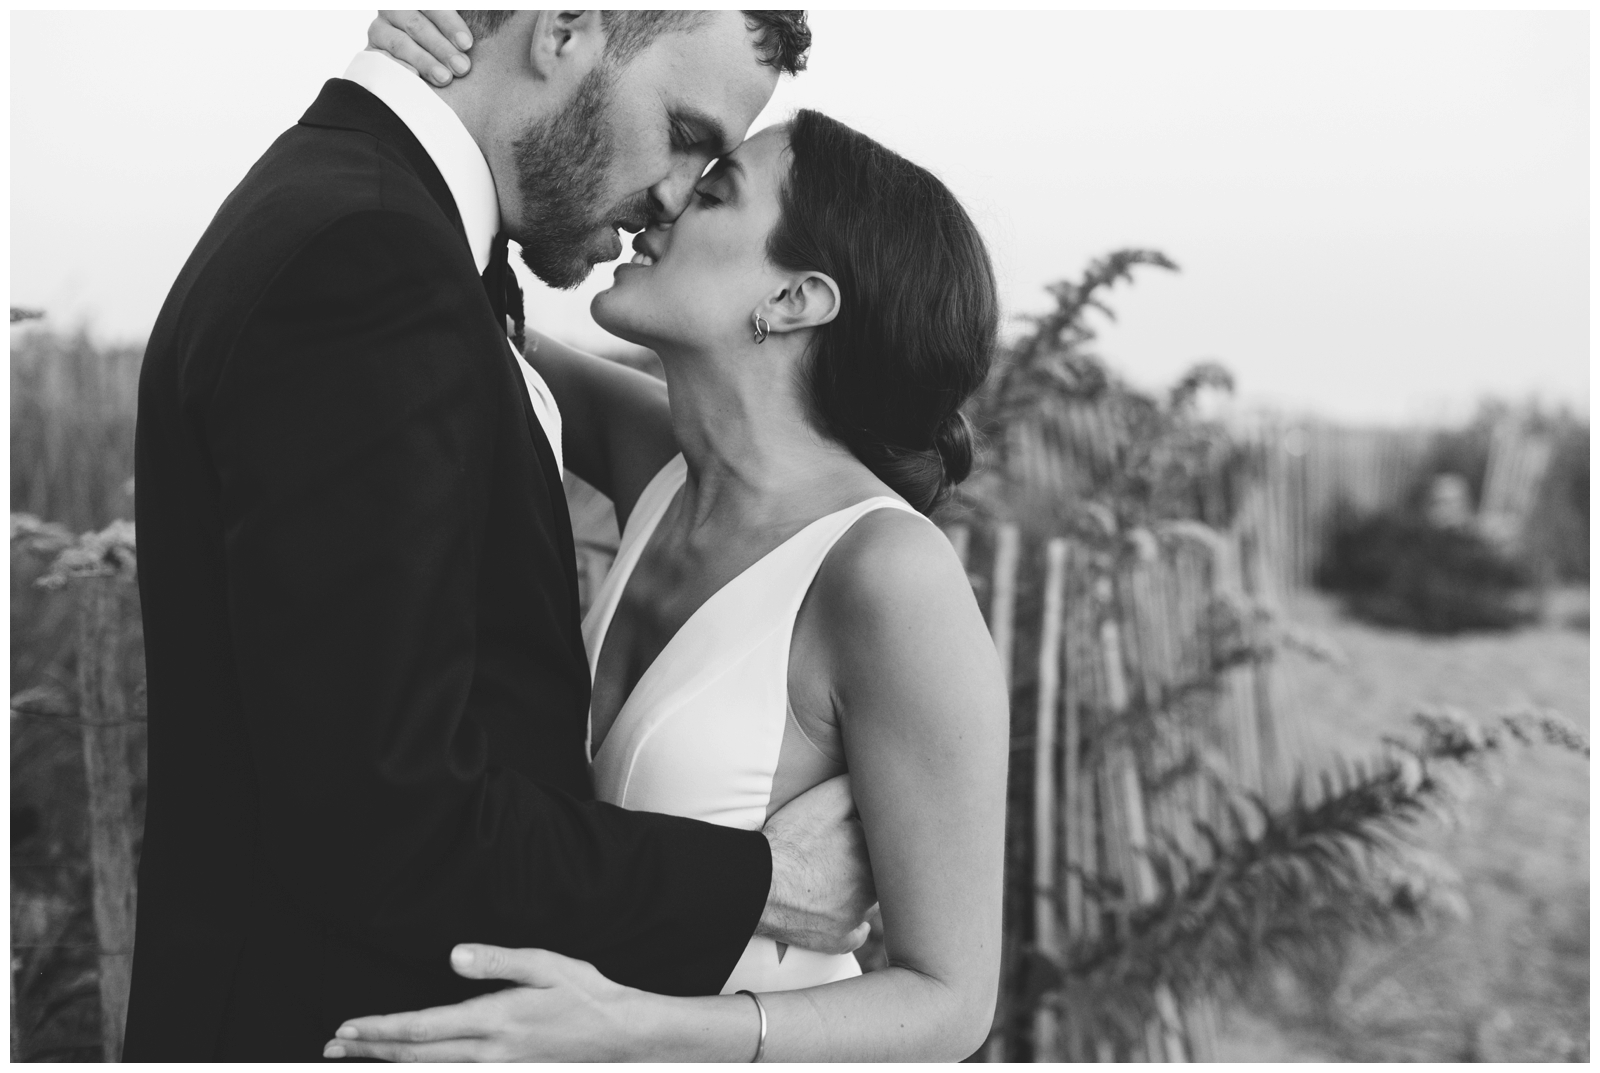 Madison-Beach-Hotel-Wedding-Bailey-Q-Photo-Boston-Wedding-Photographer-051.jpg